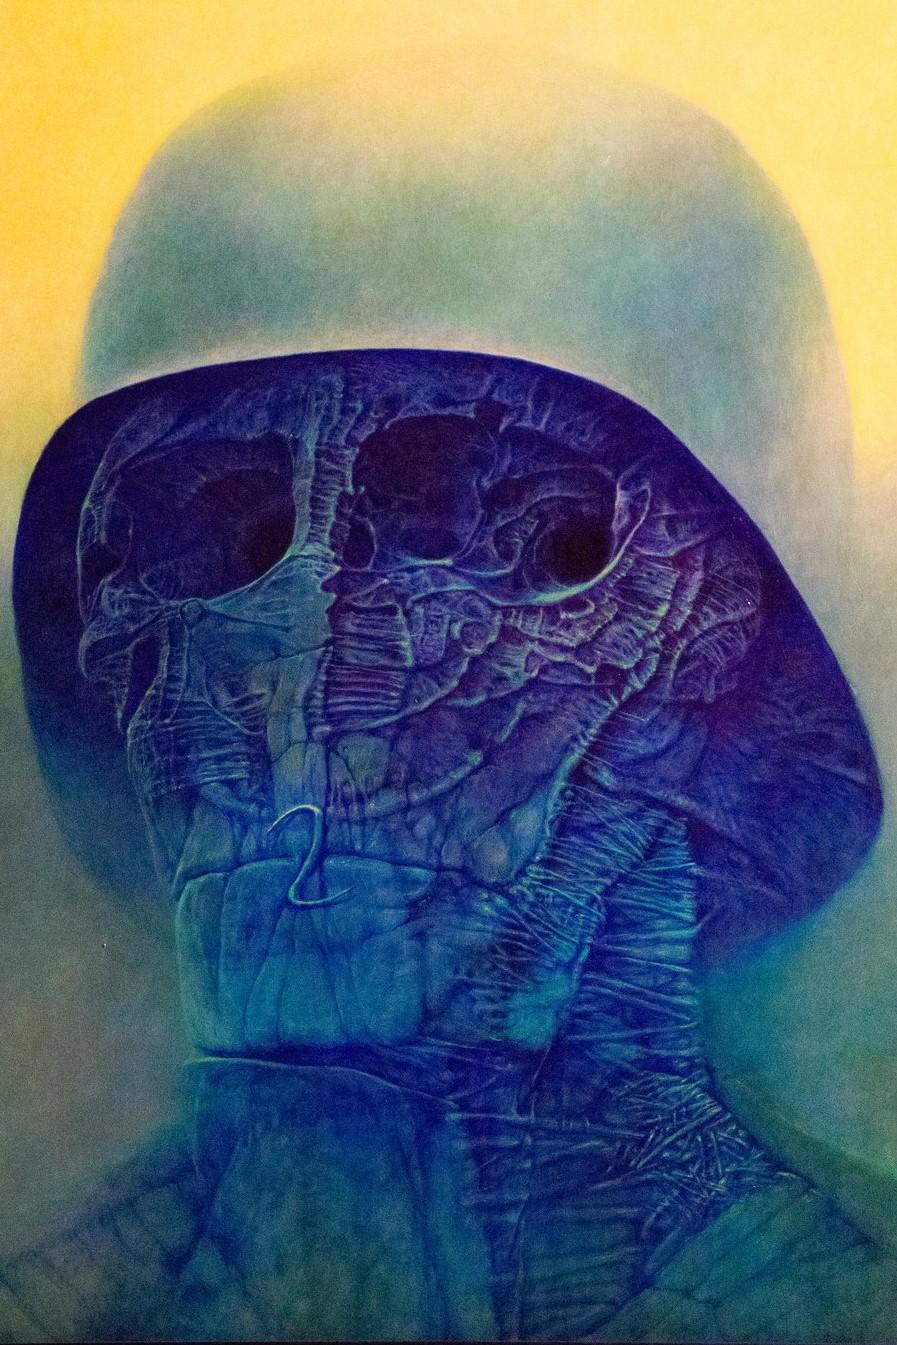 "<img src=""painting.png"" alt=""Zdzisław Beksiński's painting"">"